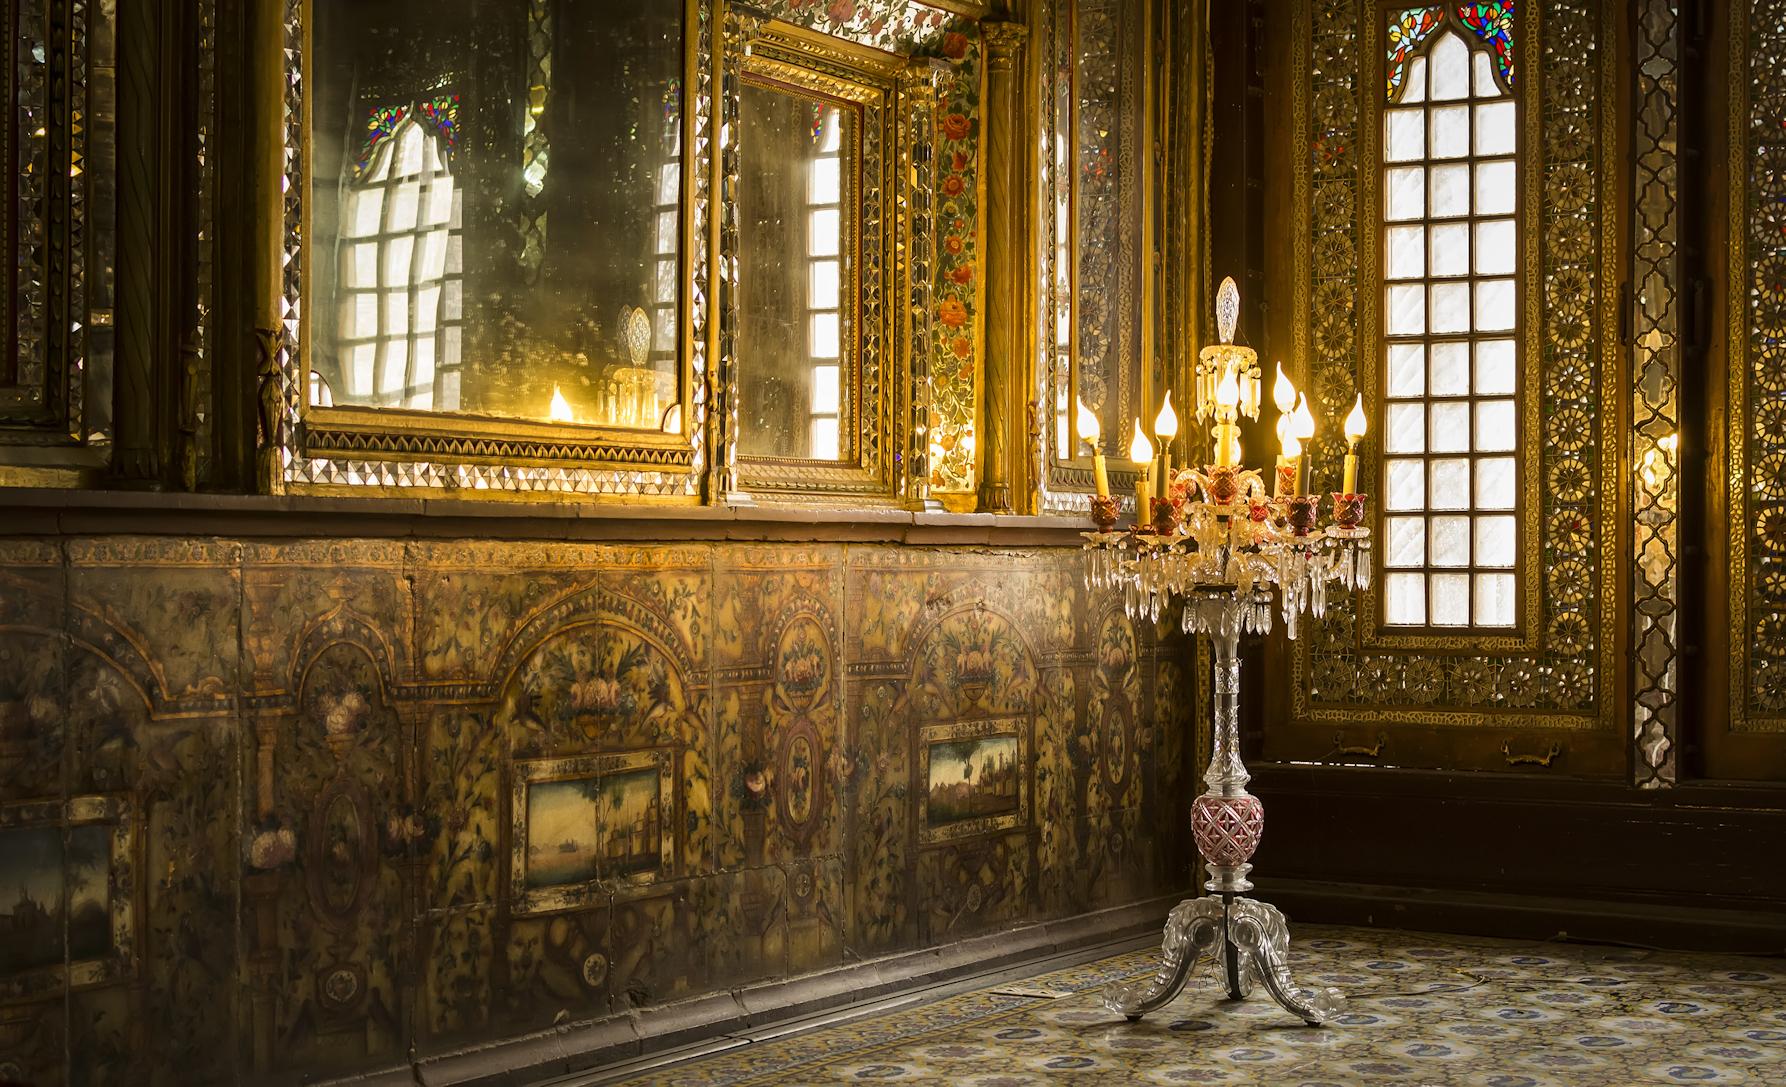 G & P Cohn Antique Chandeliers, Candelabra, Wall Lights